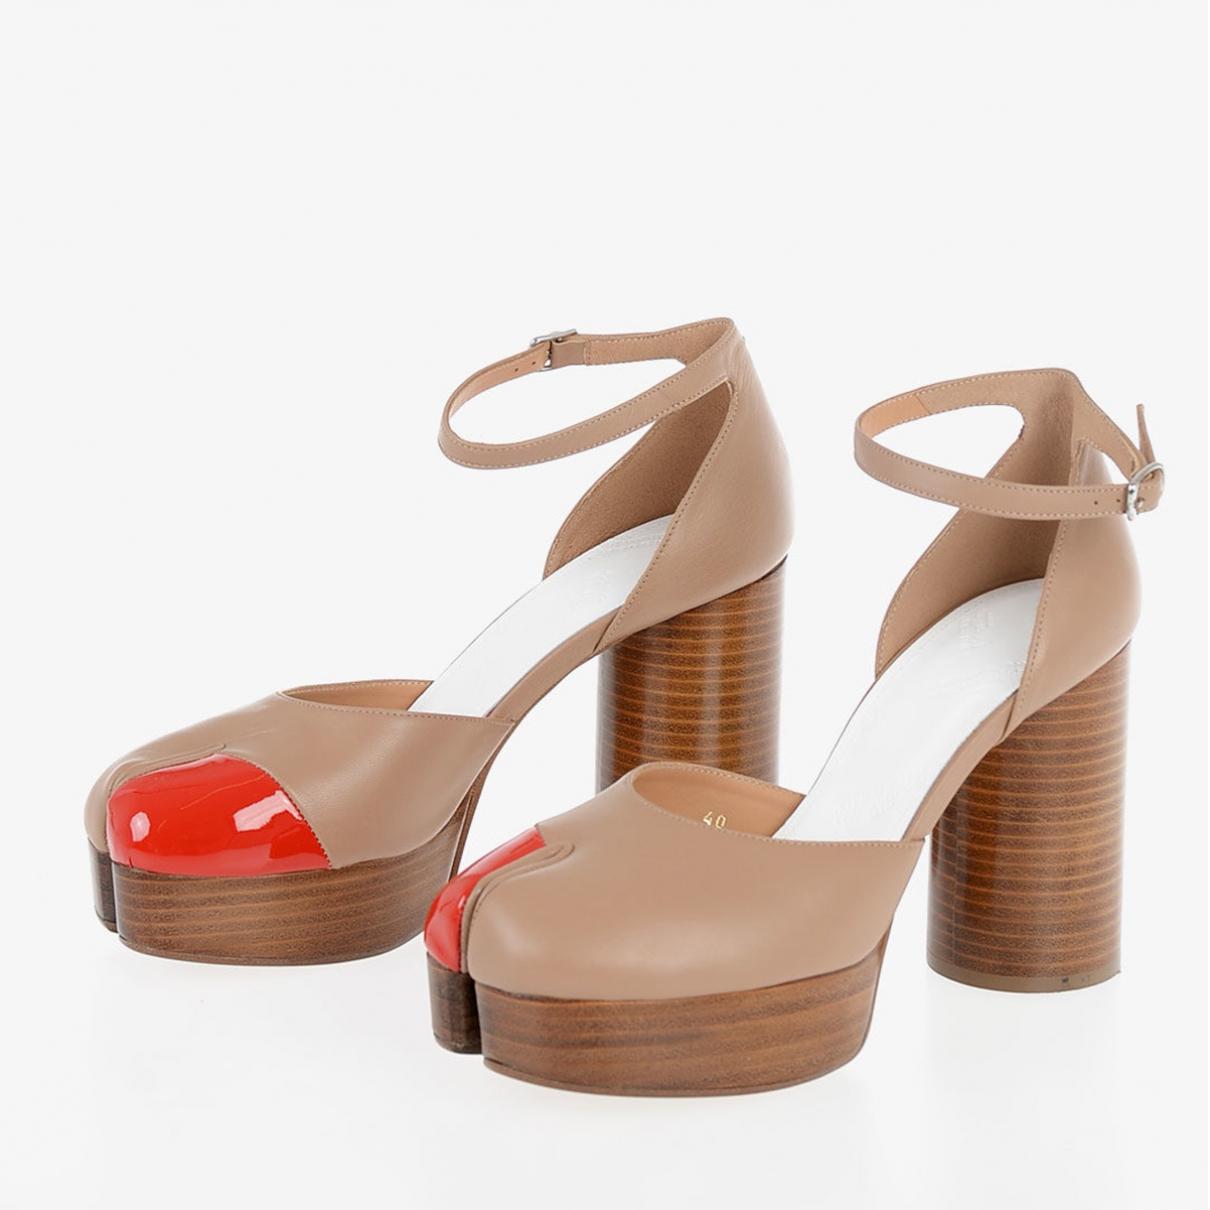 Maison Martin Margiela \N Camel Leather Heels for Women 38 EU